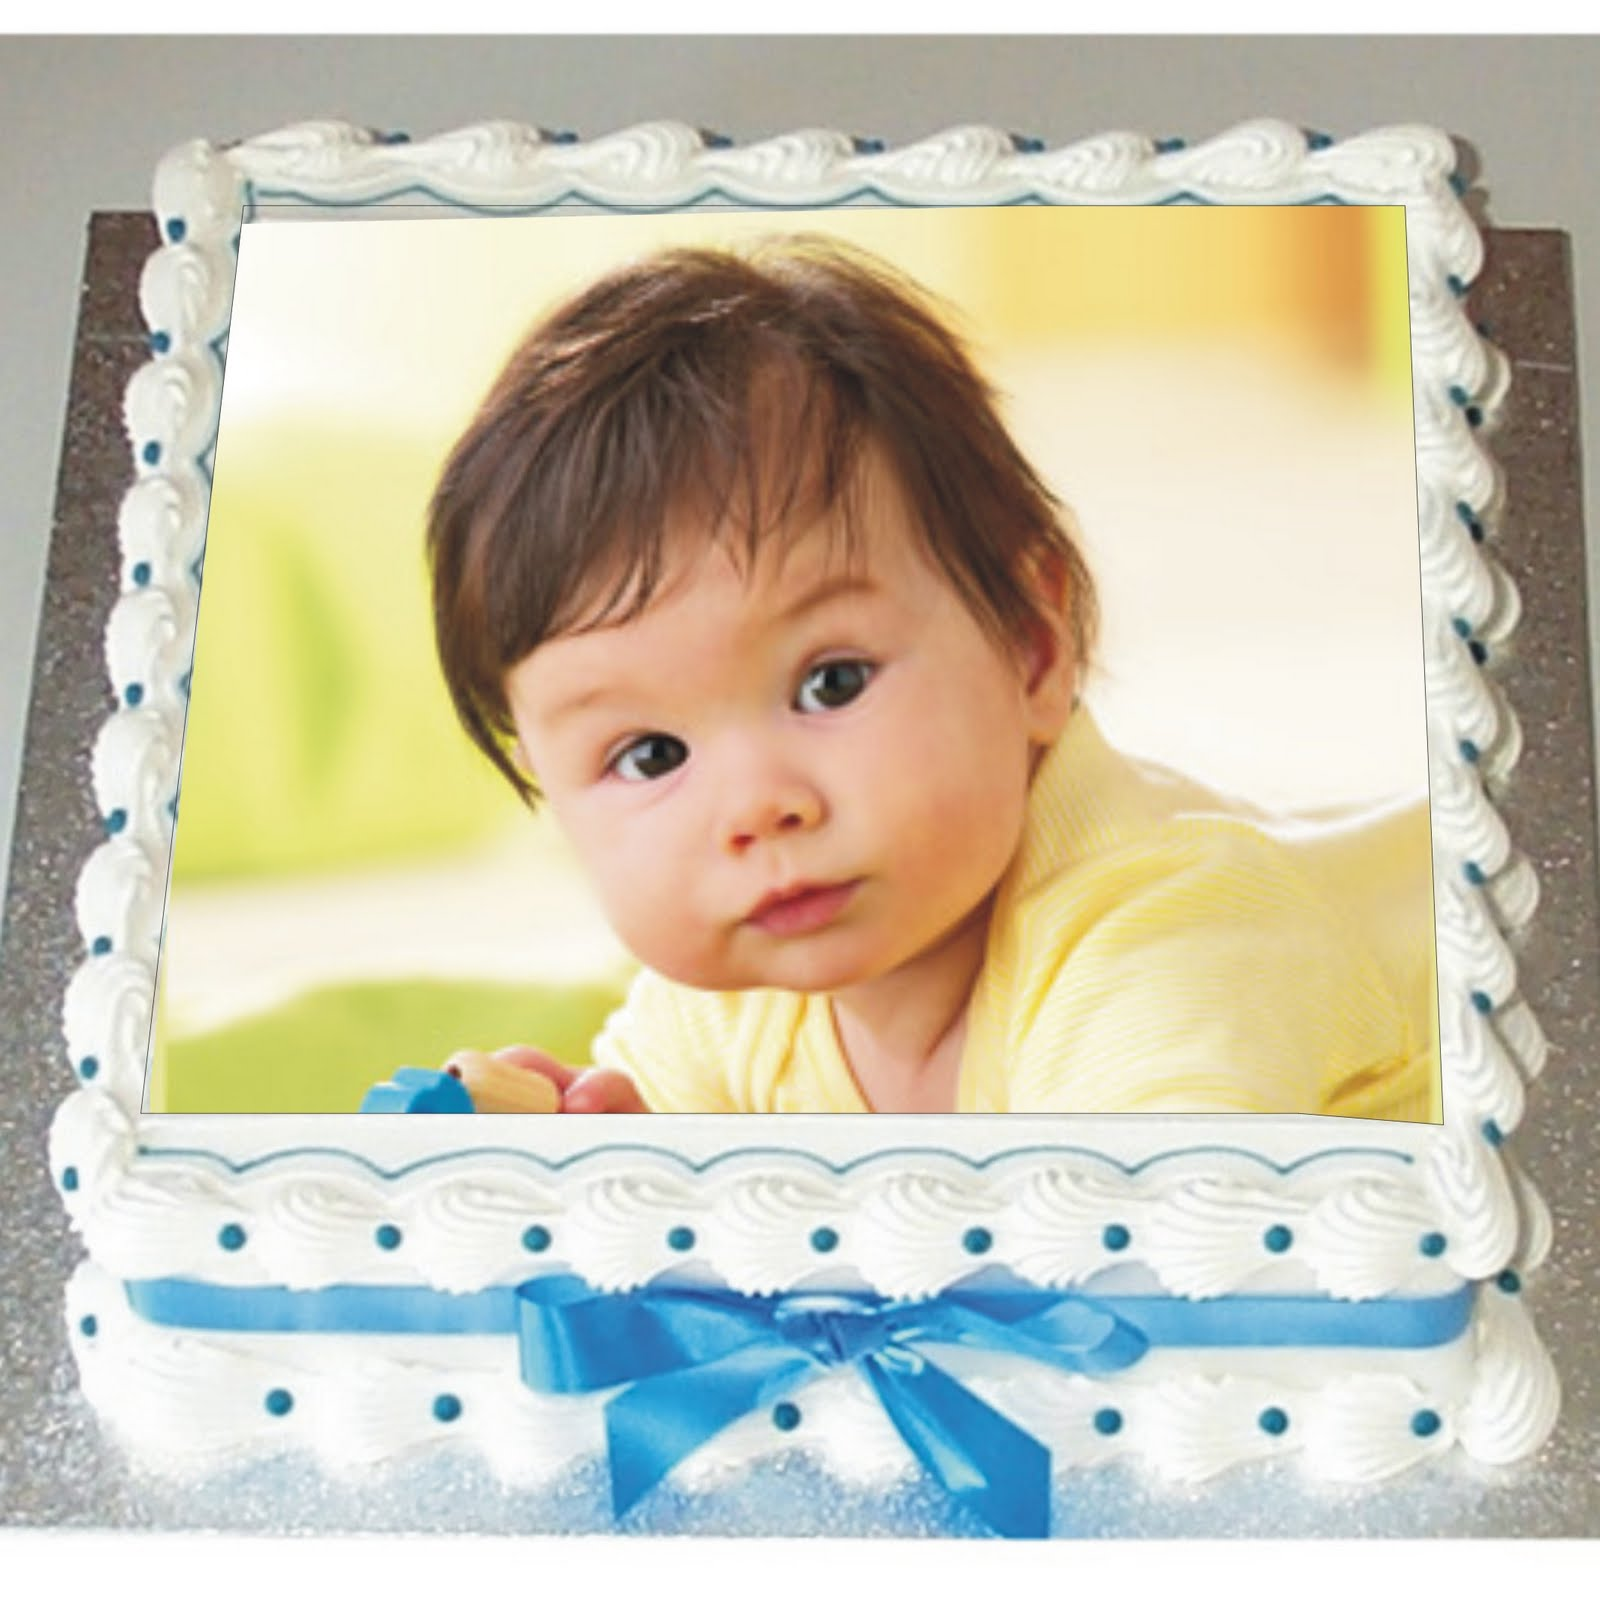 Online Designer Birthday Photo Cake Cake With Photo Online Yummycake